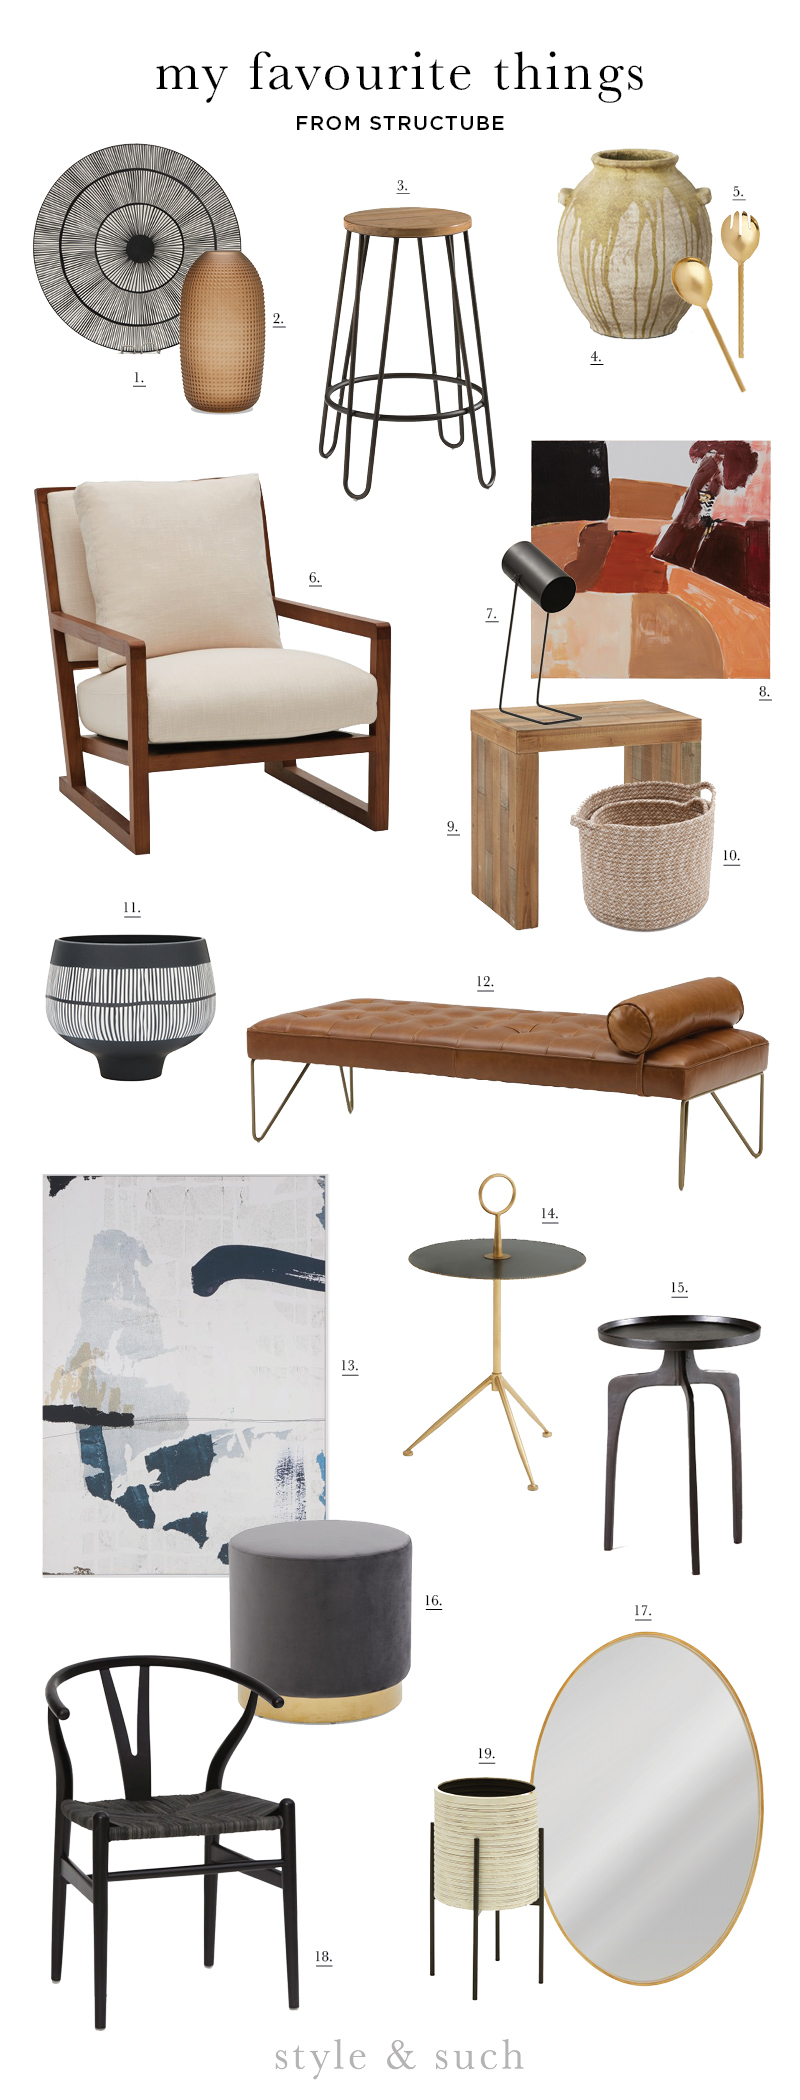 1.  Ceramic Serving Dish  | 2.  Glass Vase  | 3.  Lars Counter Stool  | 4.  Cement Vase  | 5.  Salad Serveware  | 6.  Teak Armchair  | 7.  Arta Table Lamp  | 8.  Shira Wall Art  | 9.  Samia End Table  | 10.  Woven Basket  | 11.  Ceramic Bowl  | 12.  Leather Day Bed  | 13.  Tessi Wall Art  | 14.  Clichy Accent Table  | 15.  Steel End Table  | 16.  Velvet Ottoman  | 17.  Noda Oval Mirror  | 18.  Denmark Dining Chair  | 19.  Banya Planter